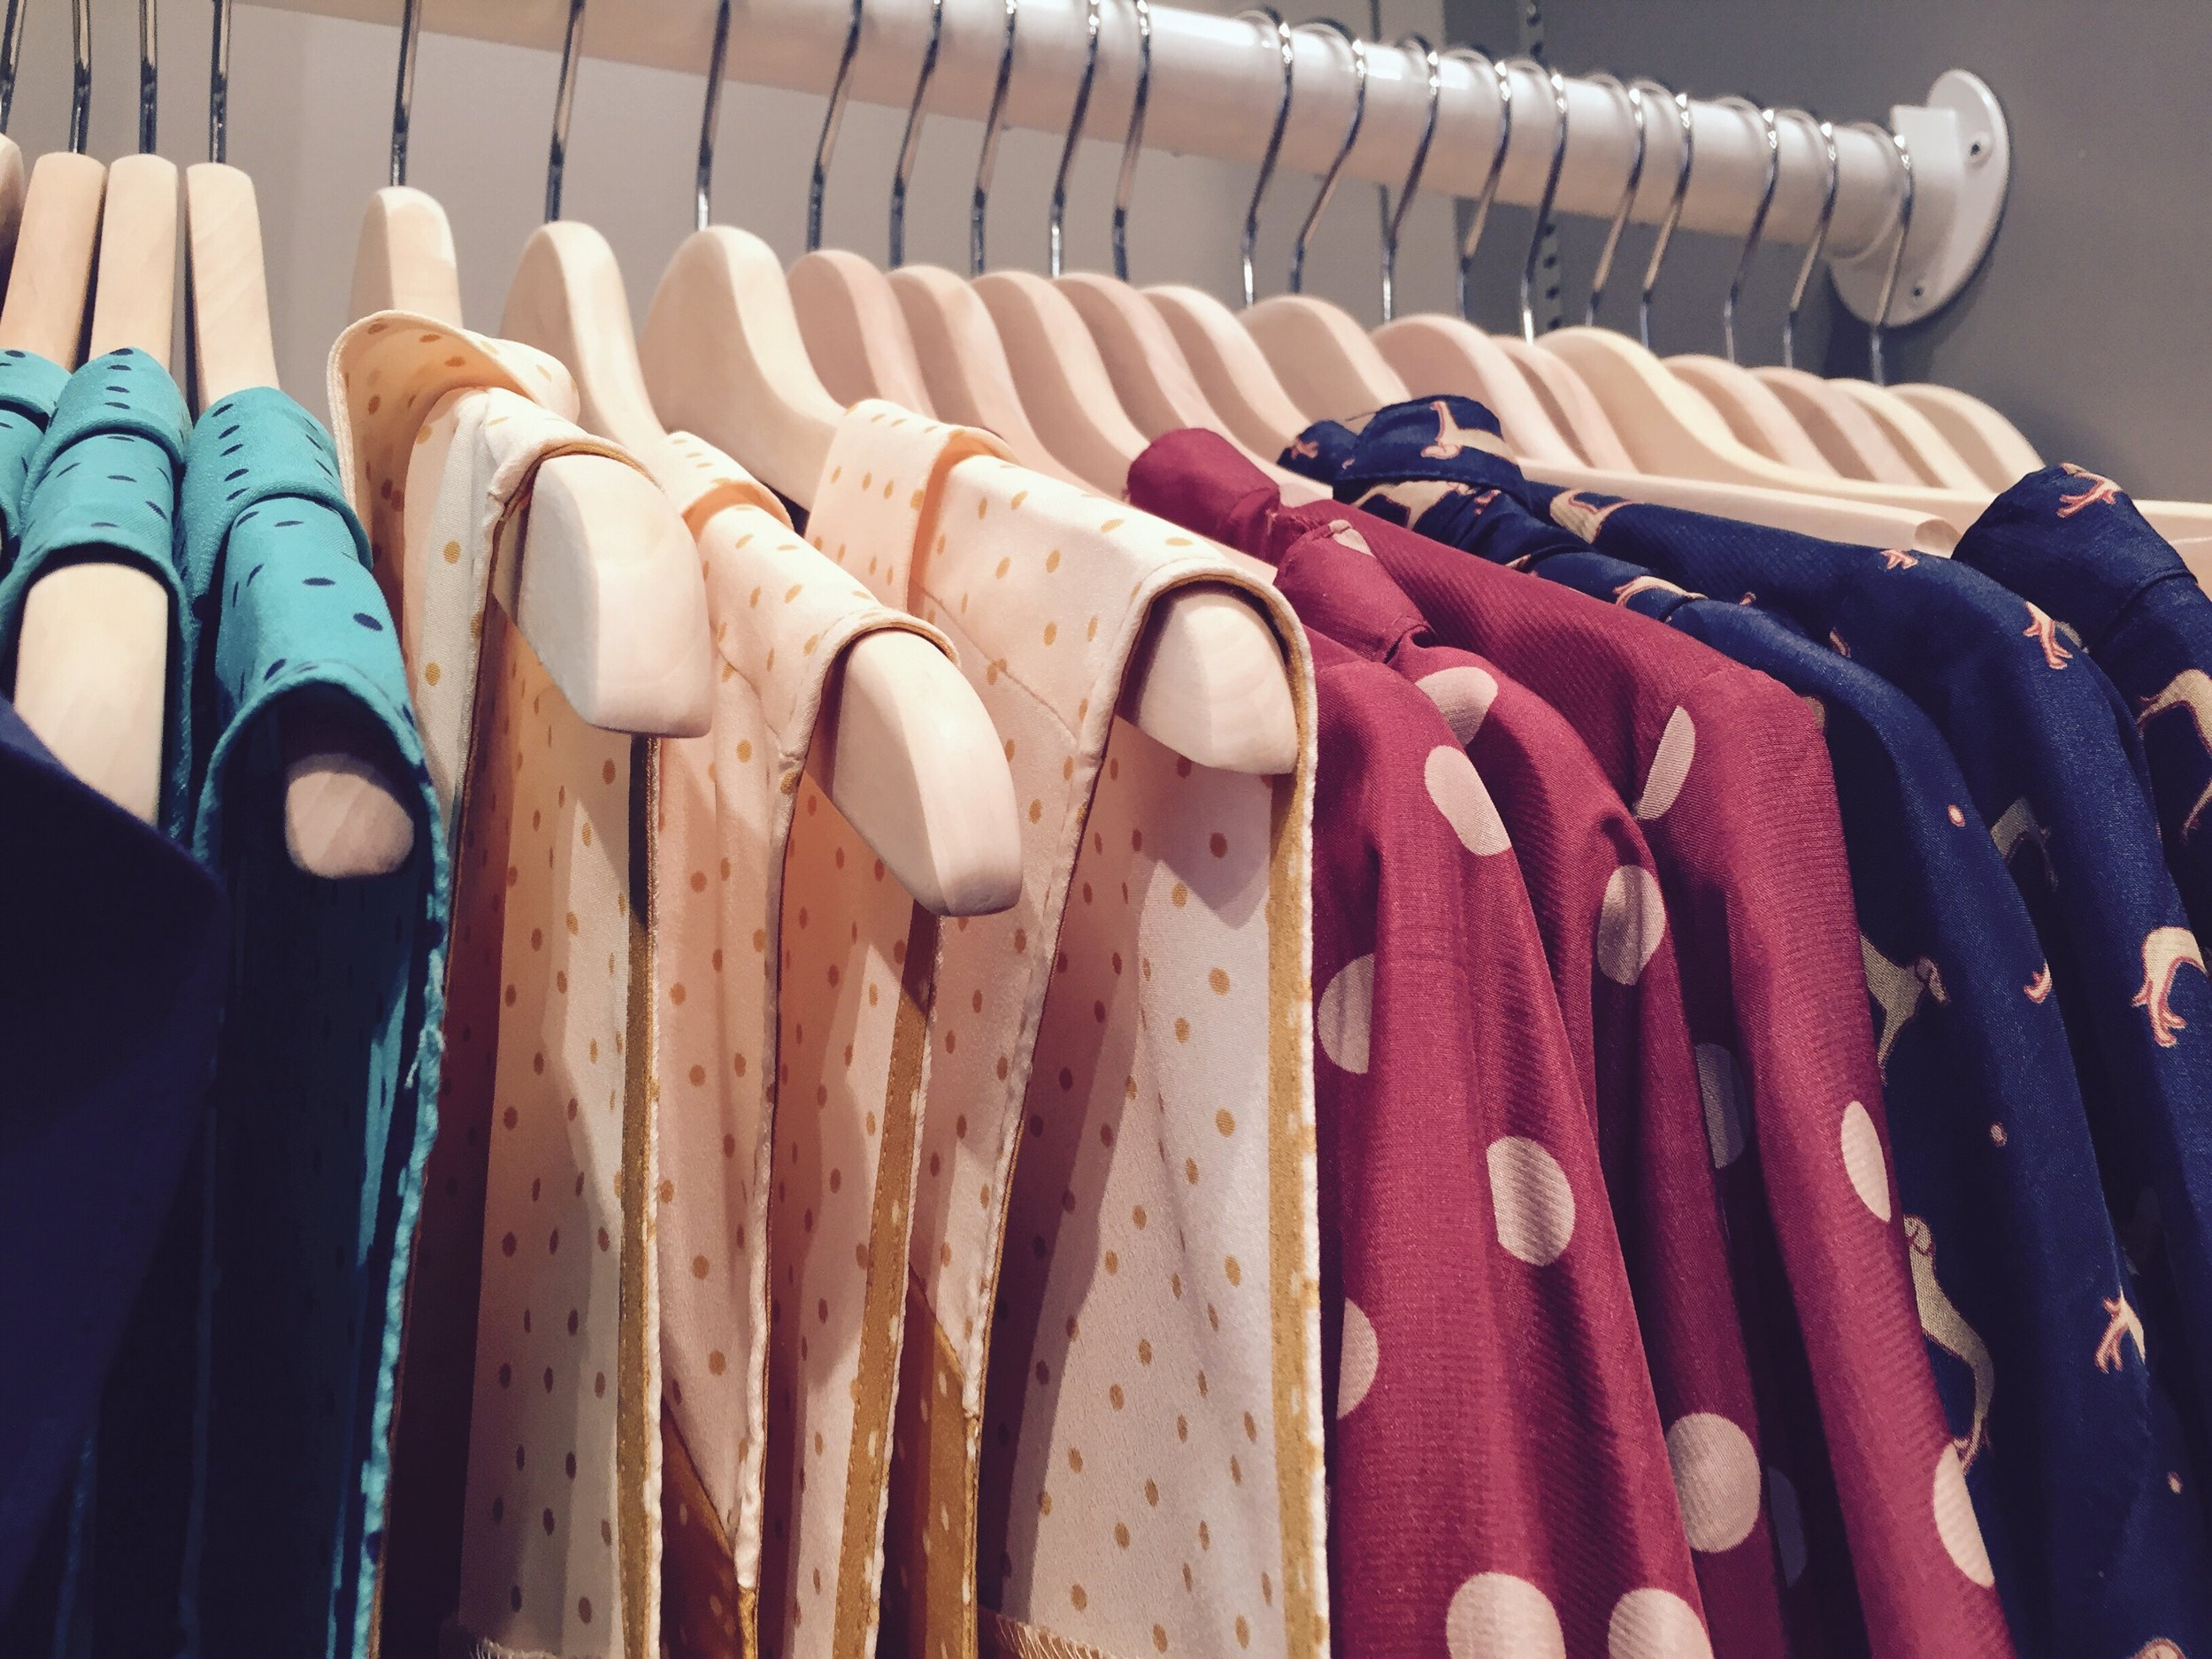 Fashion Fulfillment: The Logistics of Subscription Based Clothing